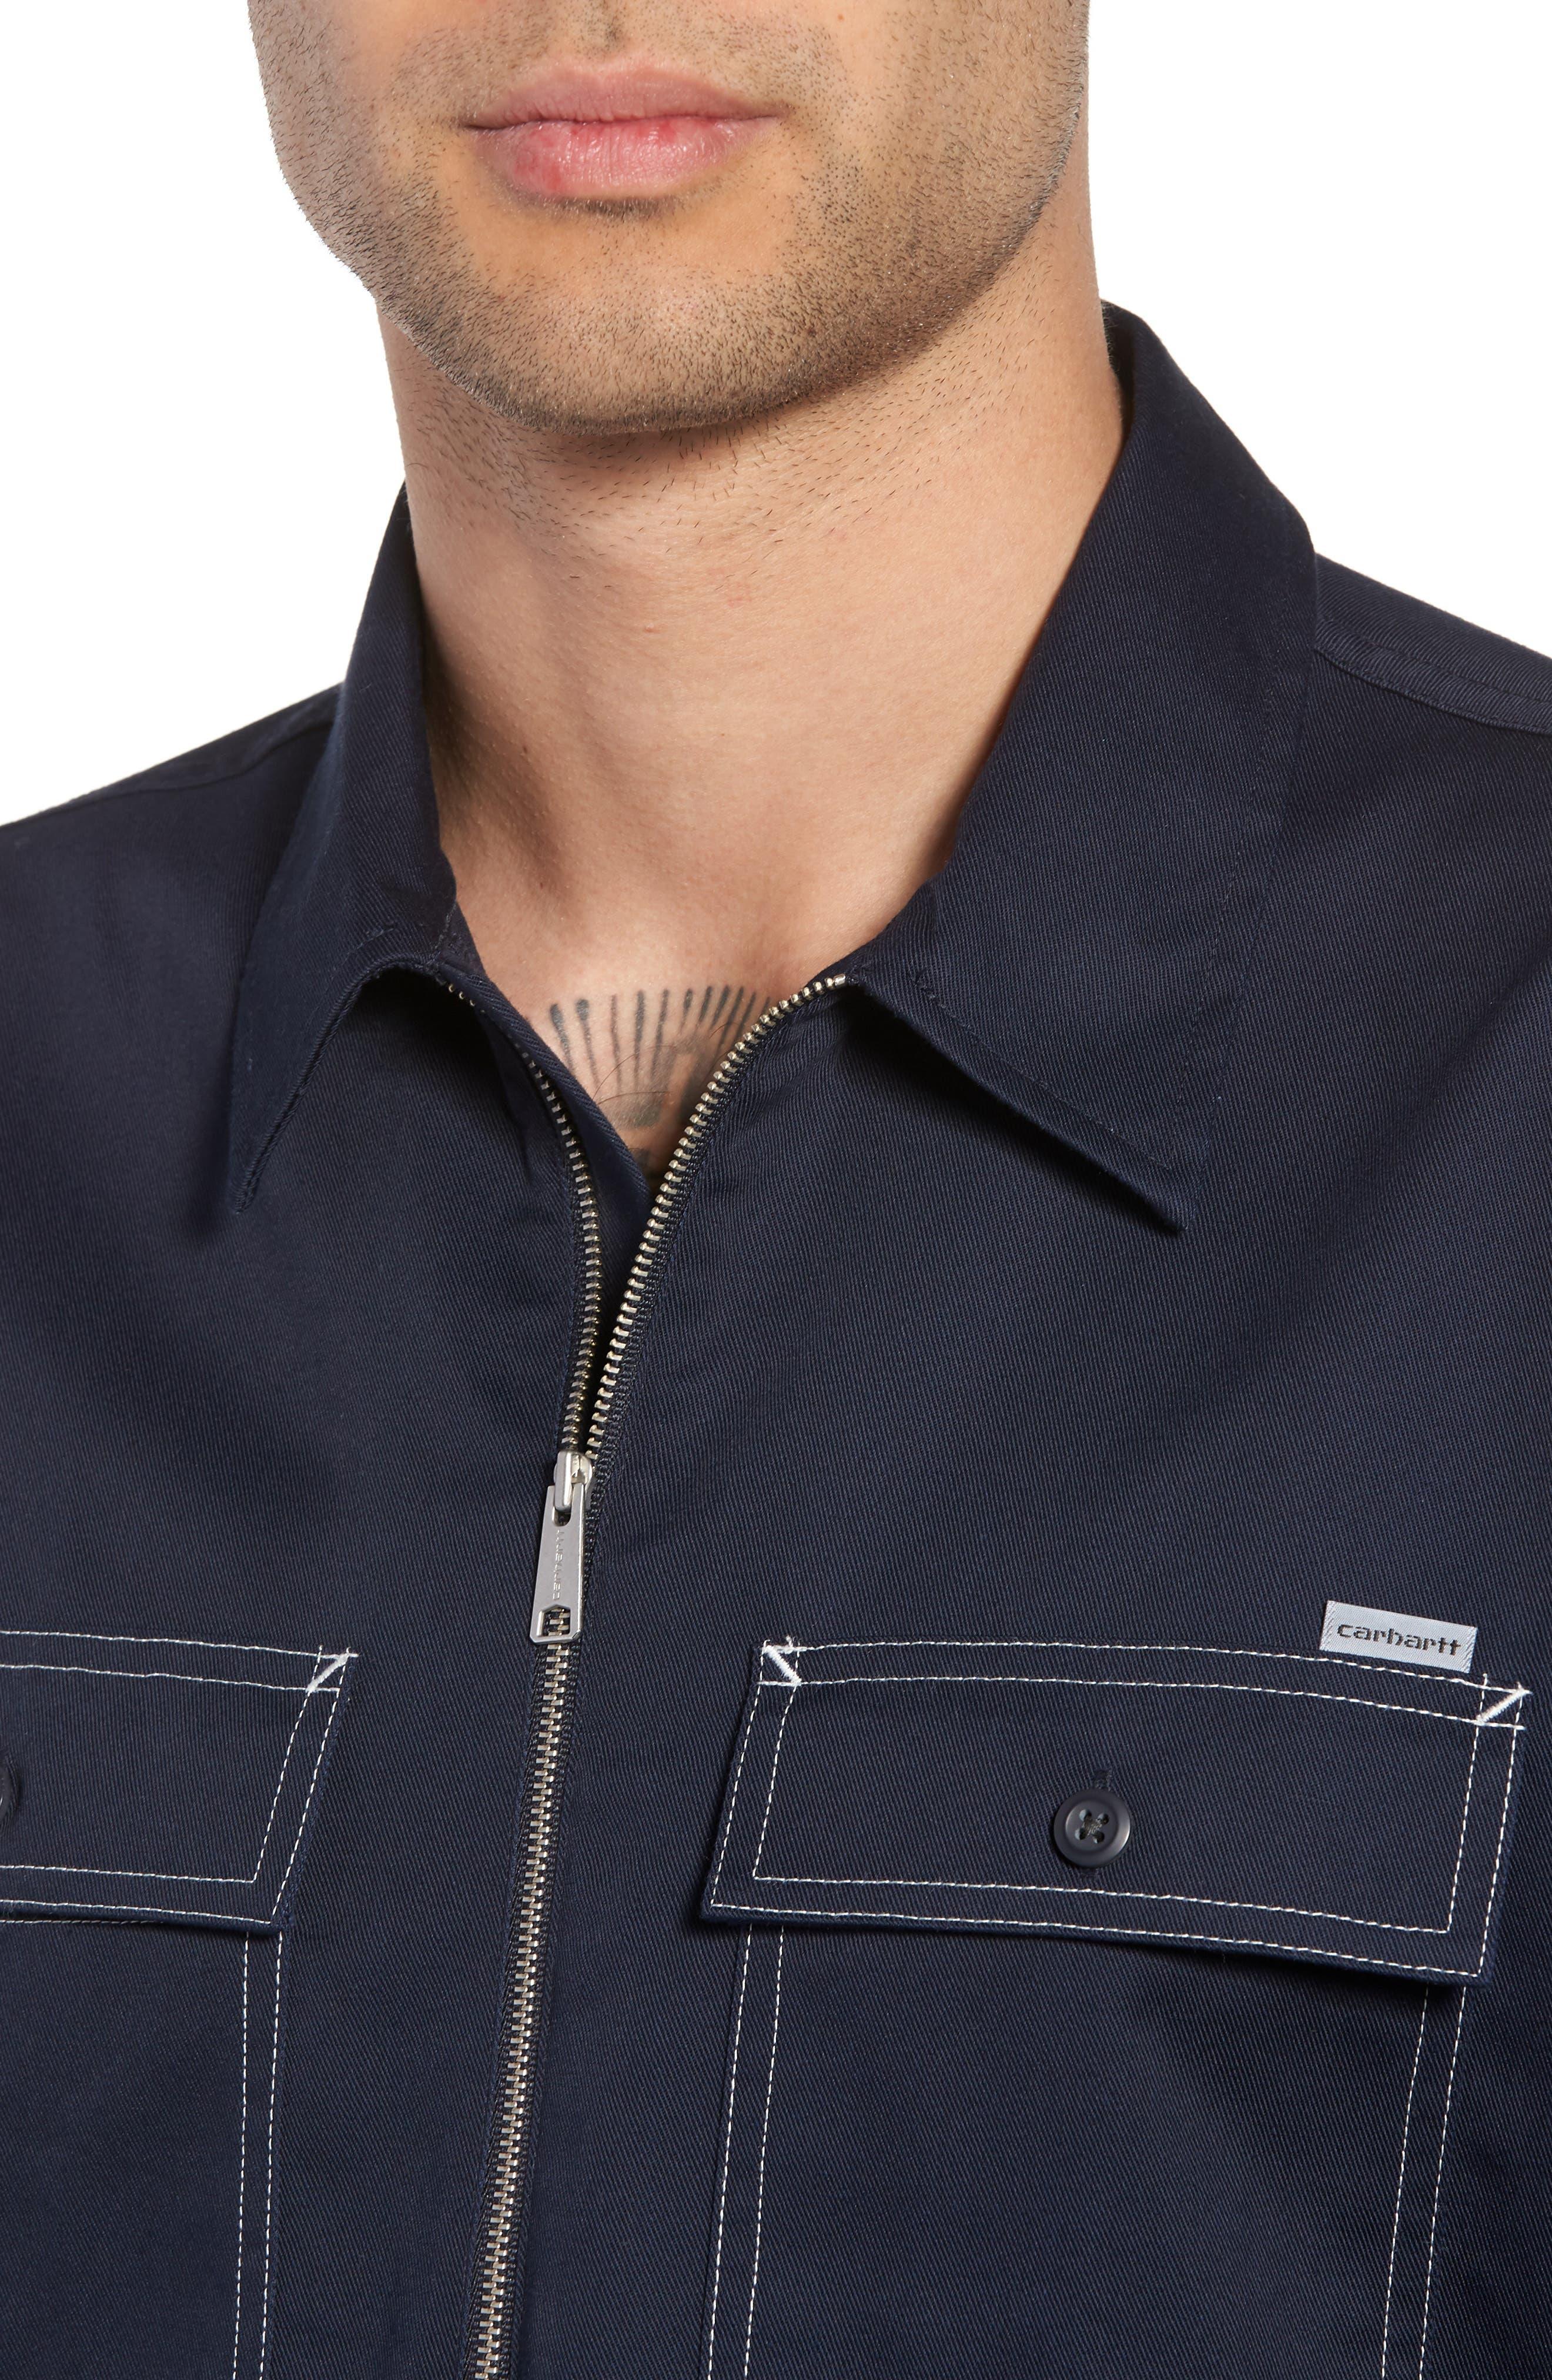 Medford Woven Shirt,                             Alternate thumbnail 2, color,                             Dark Navy